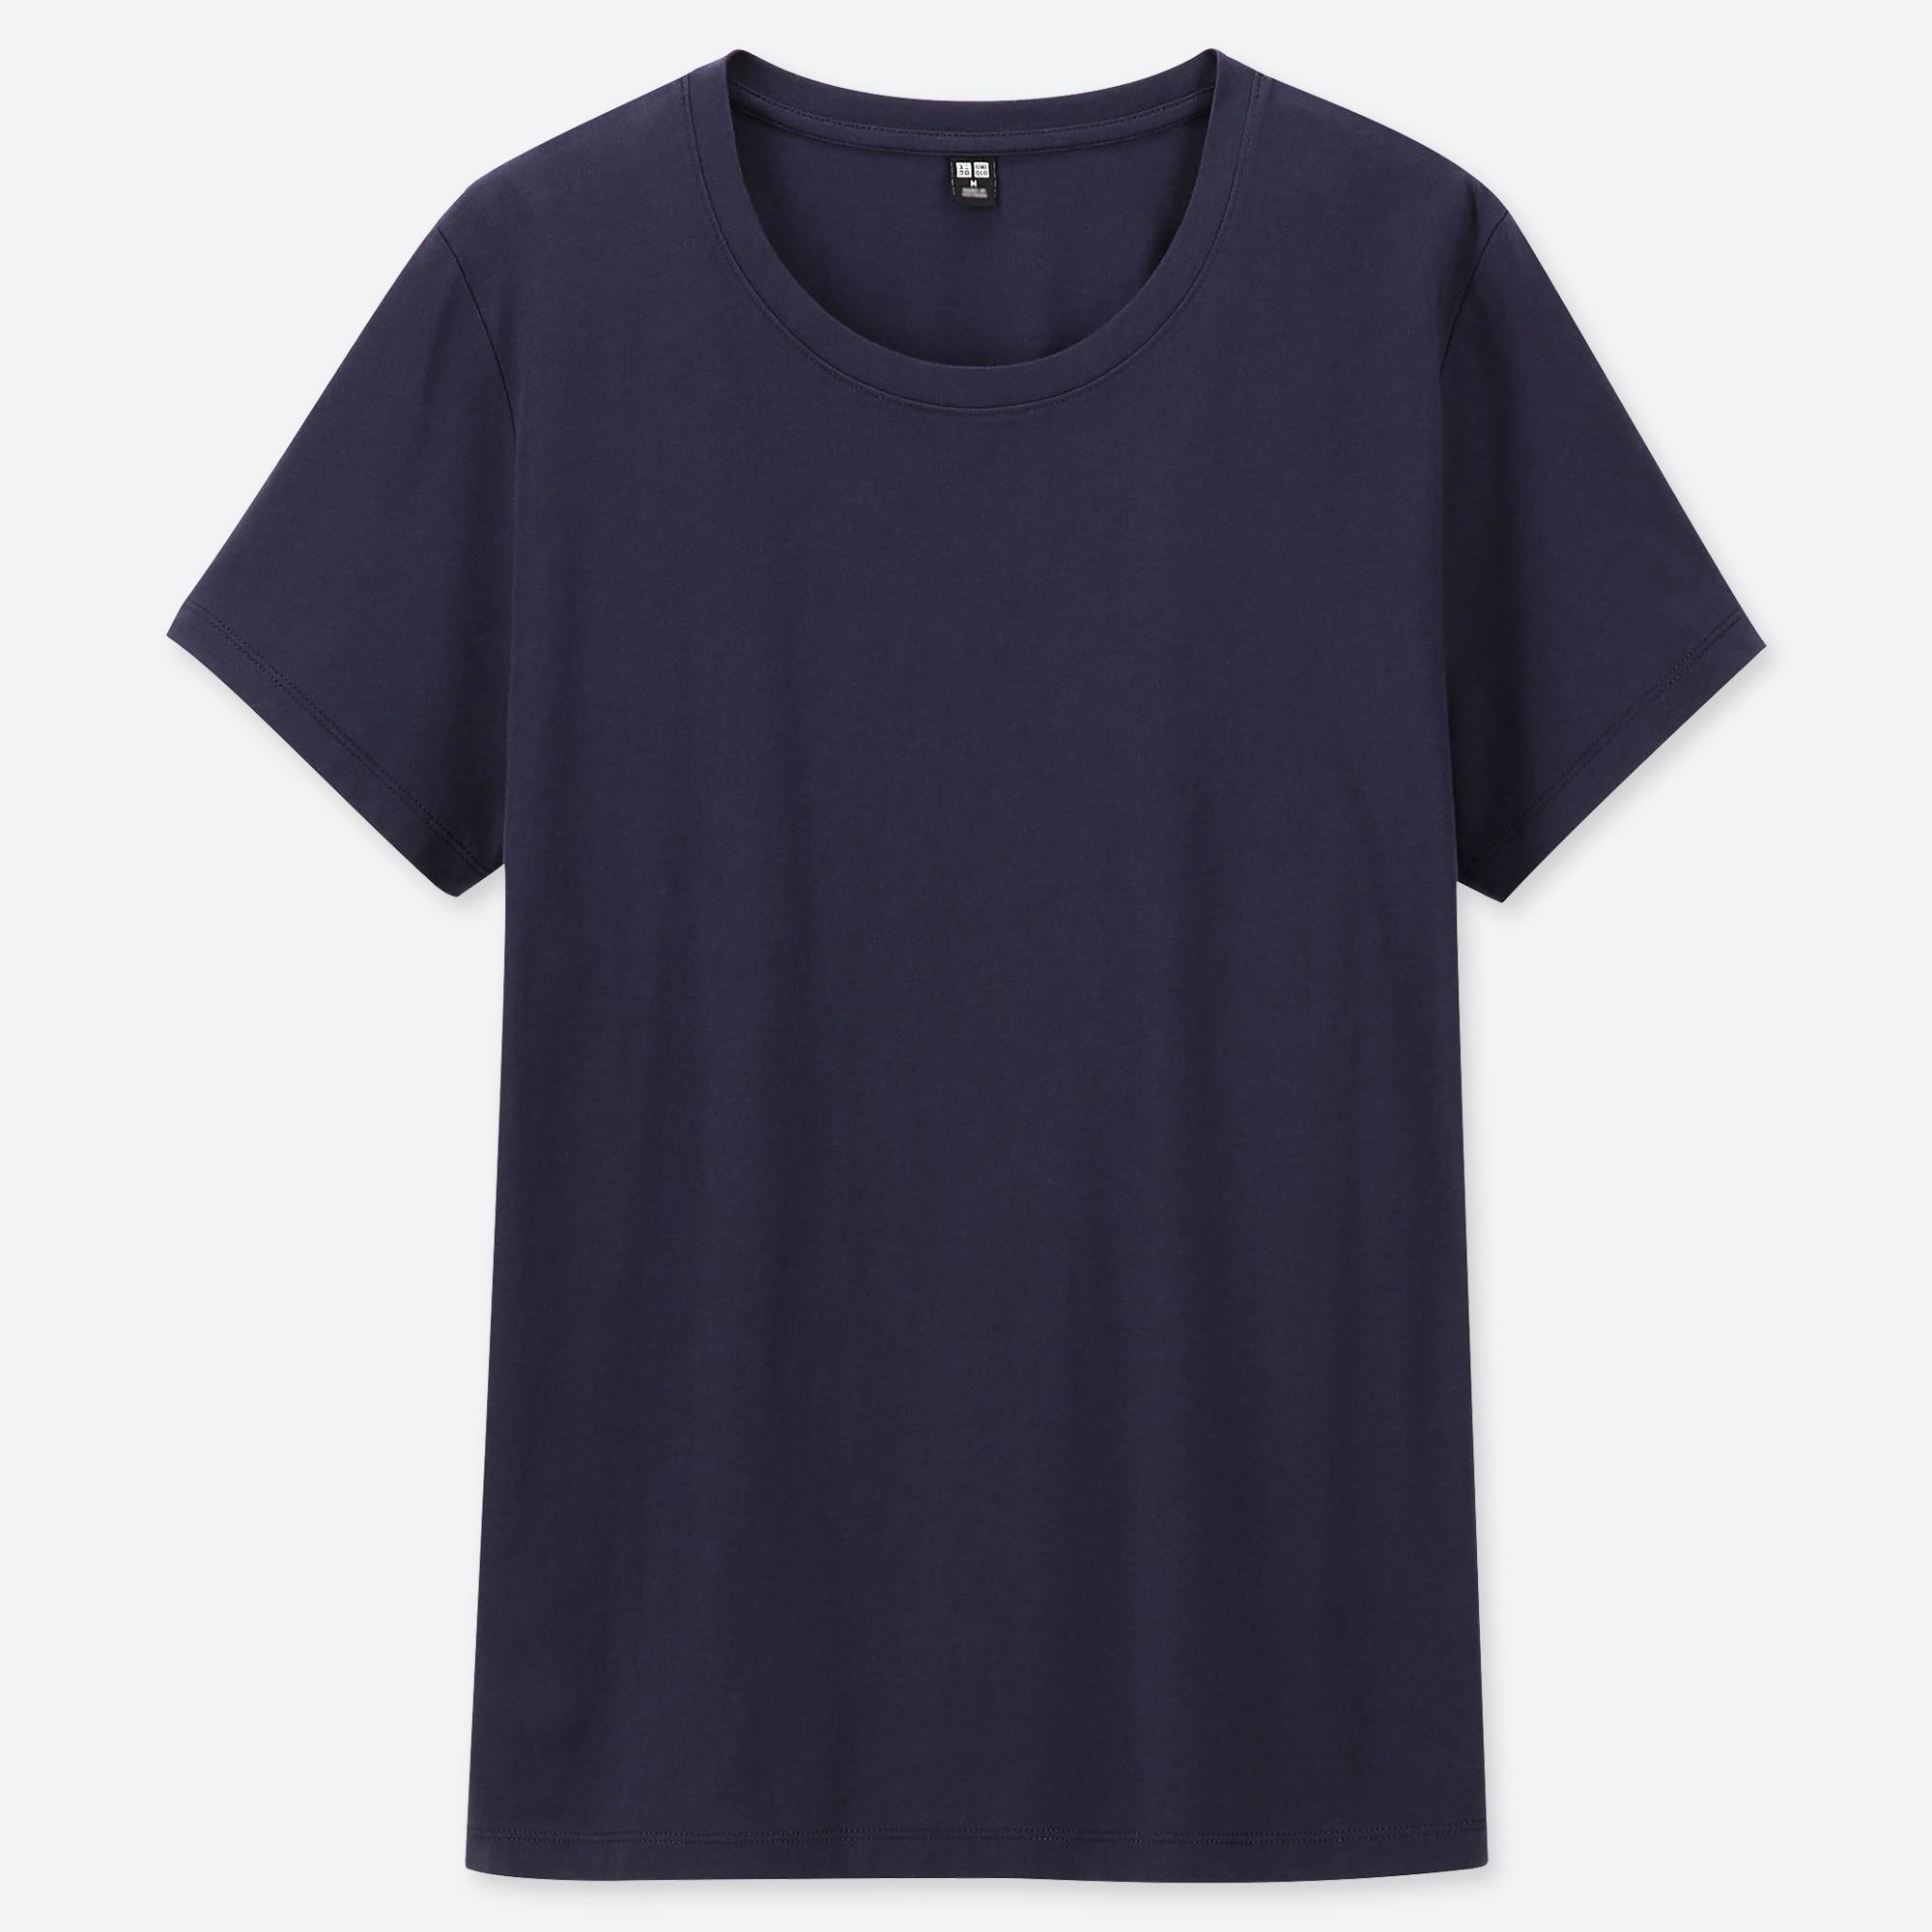 Women 100% Supima Cotton Crew Neck Short Sleeved T Shirt